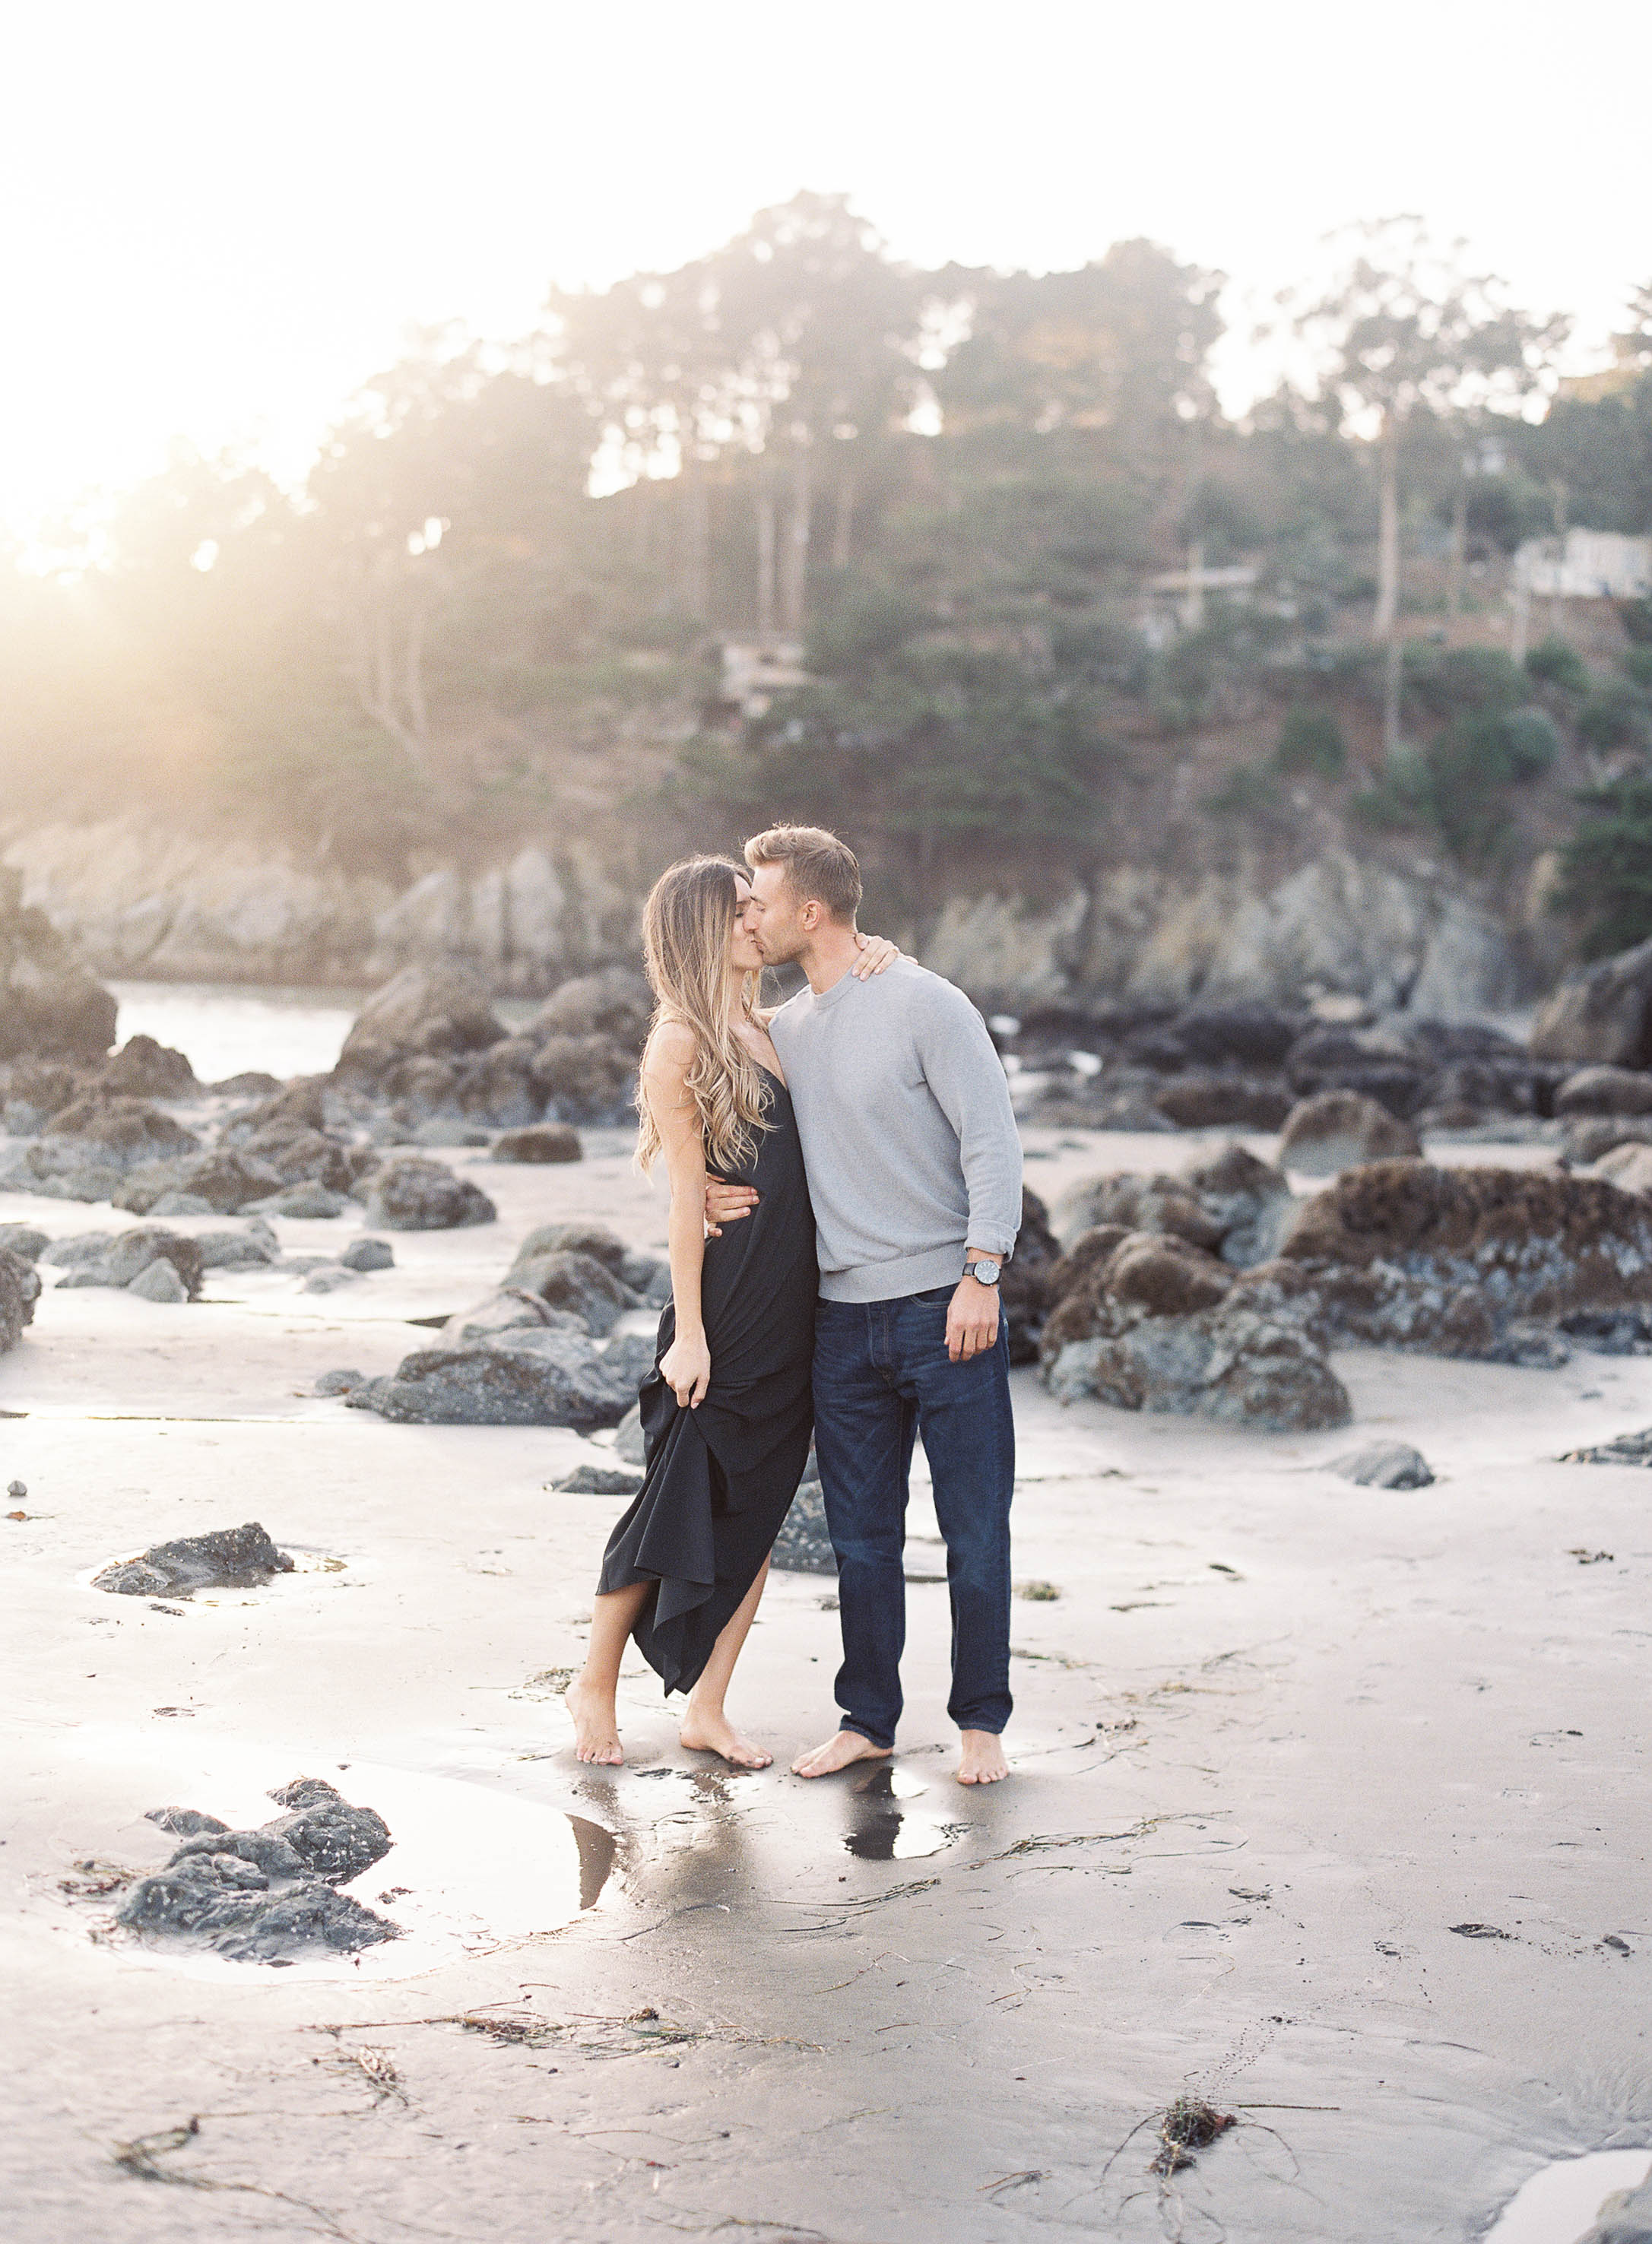 Meghan Mehan Photography - Fine Art Film Wedding Photography - San Francisco | Napa | Sonoma | Big Sur | Chicago | Minneapolis | Milwaukee | Lake Geneva | Door County | Wisconsin 015.jpg